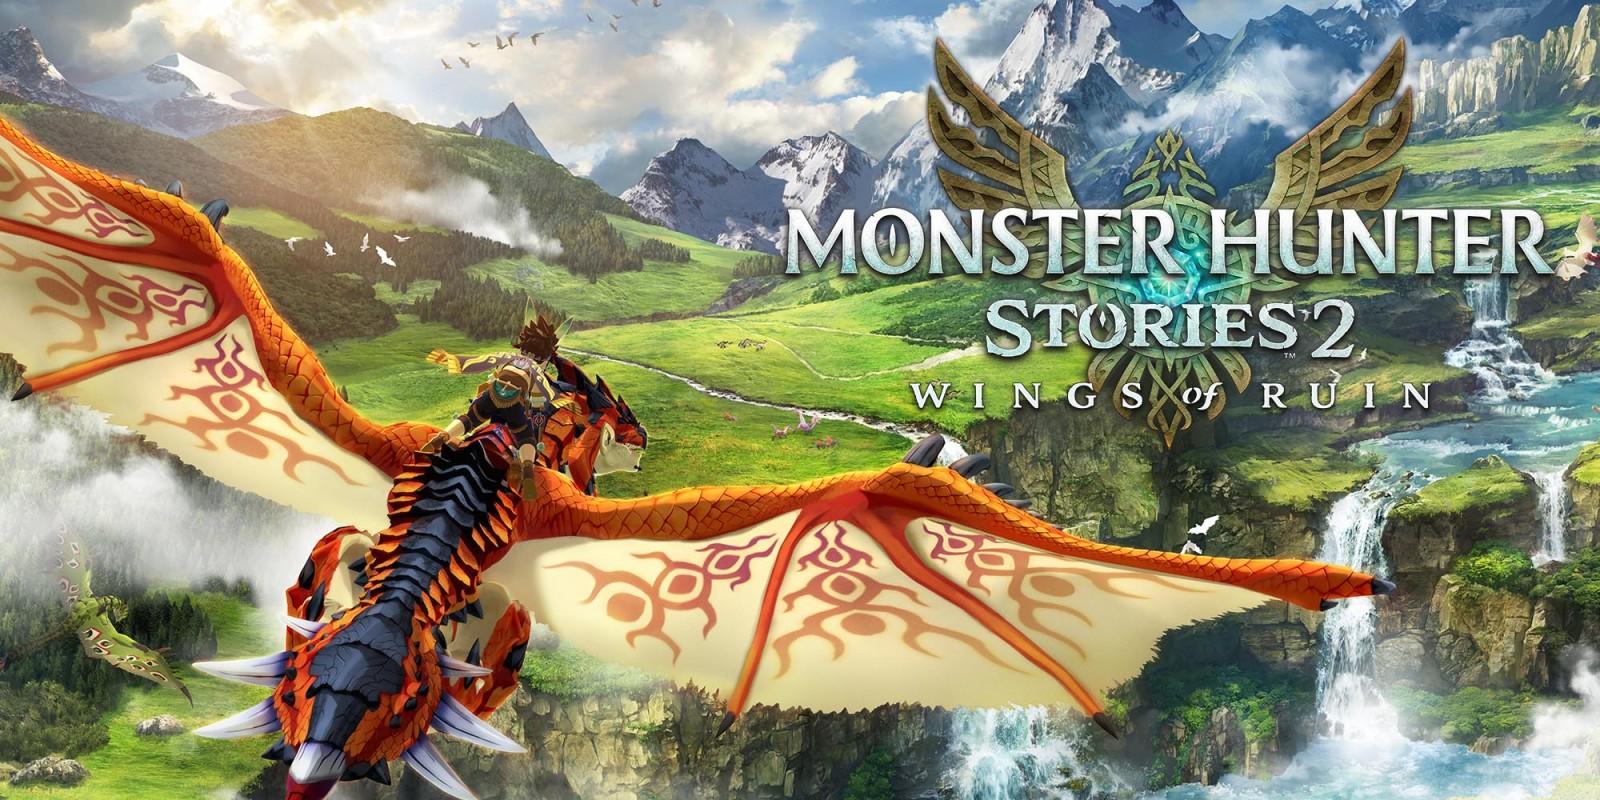 Monster Hunter Stories 2: Wings of Ruin Офлайн АВТО-АКТИВАЦИЯ Deluxe Edition🌎GLOBAL